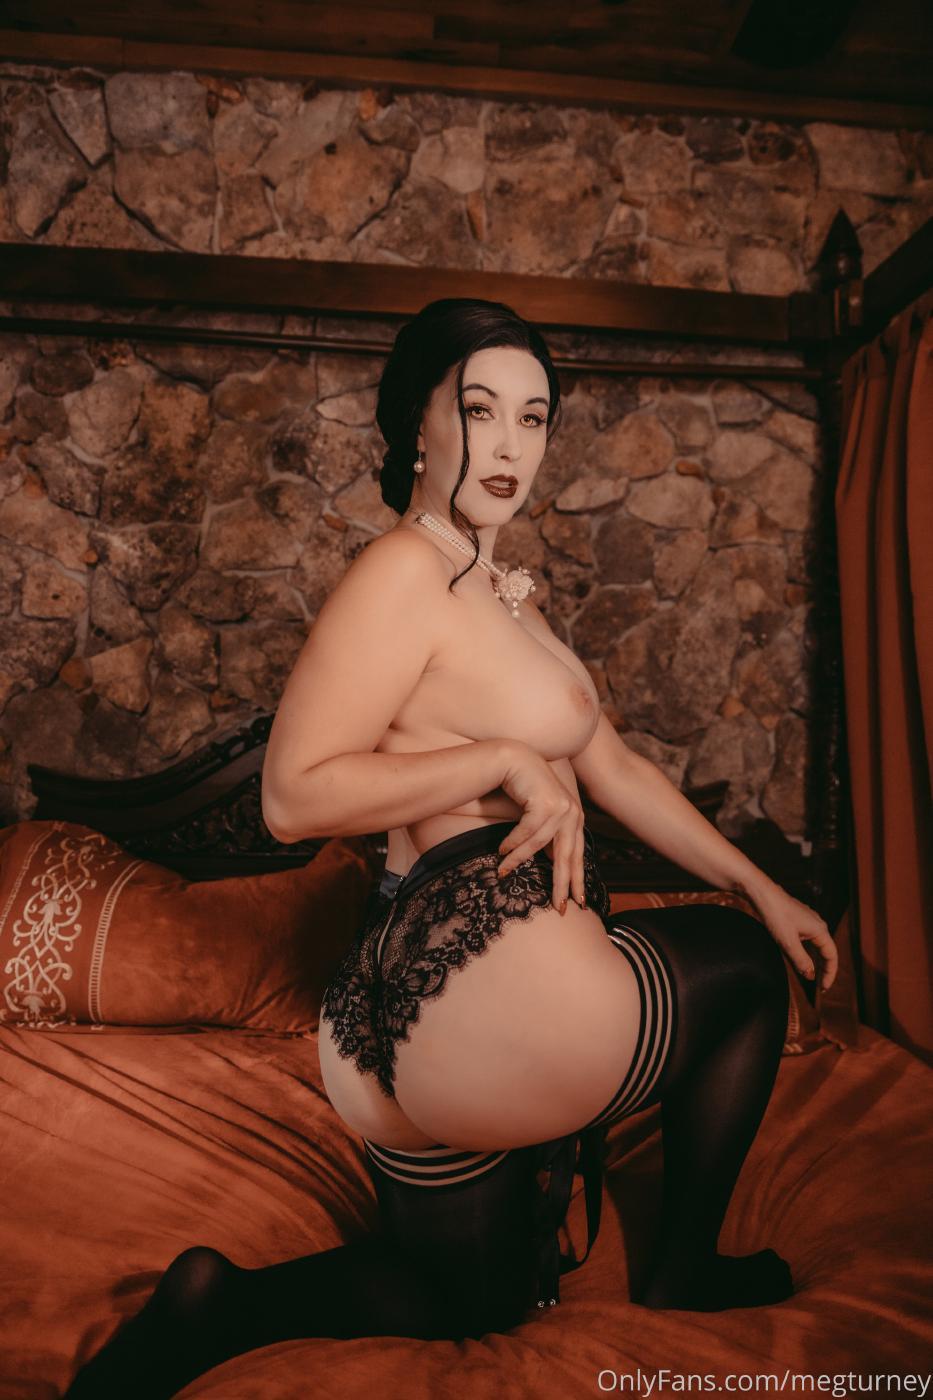 Meg Turney Lady Dimitrescu Cosplay Onlyfans Set Leaked 0029